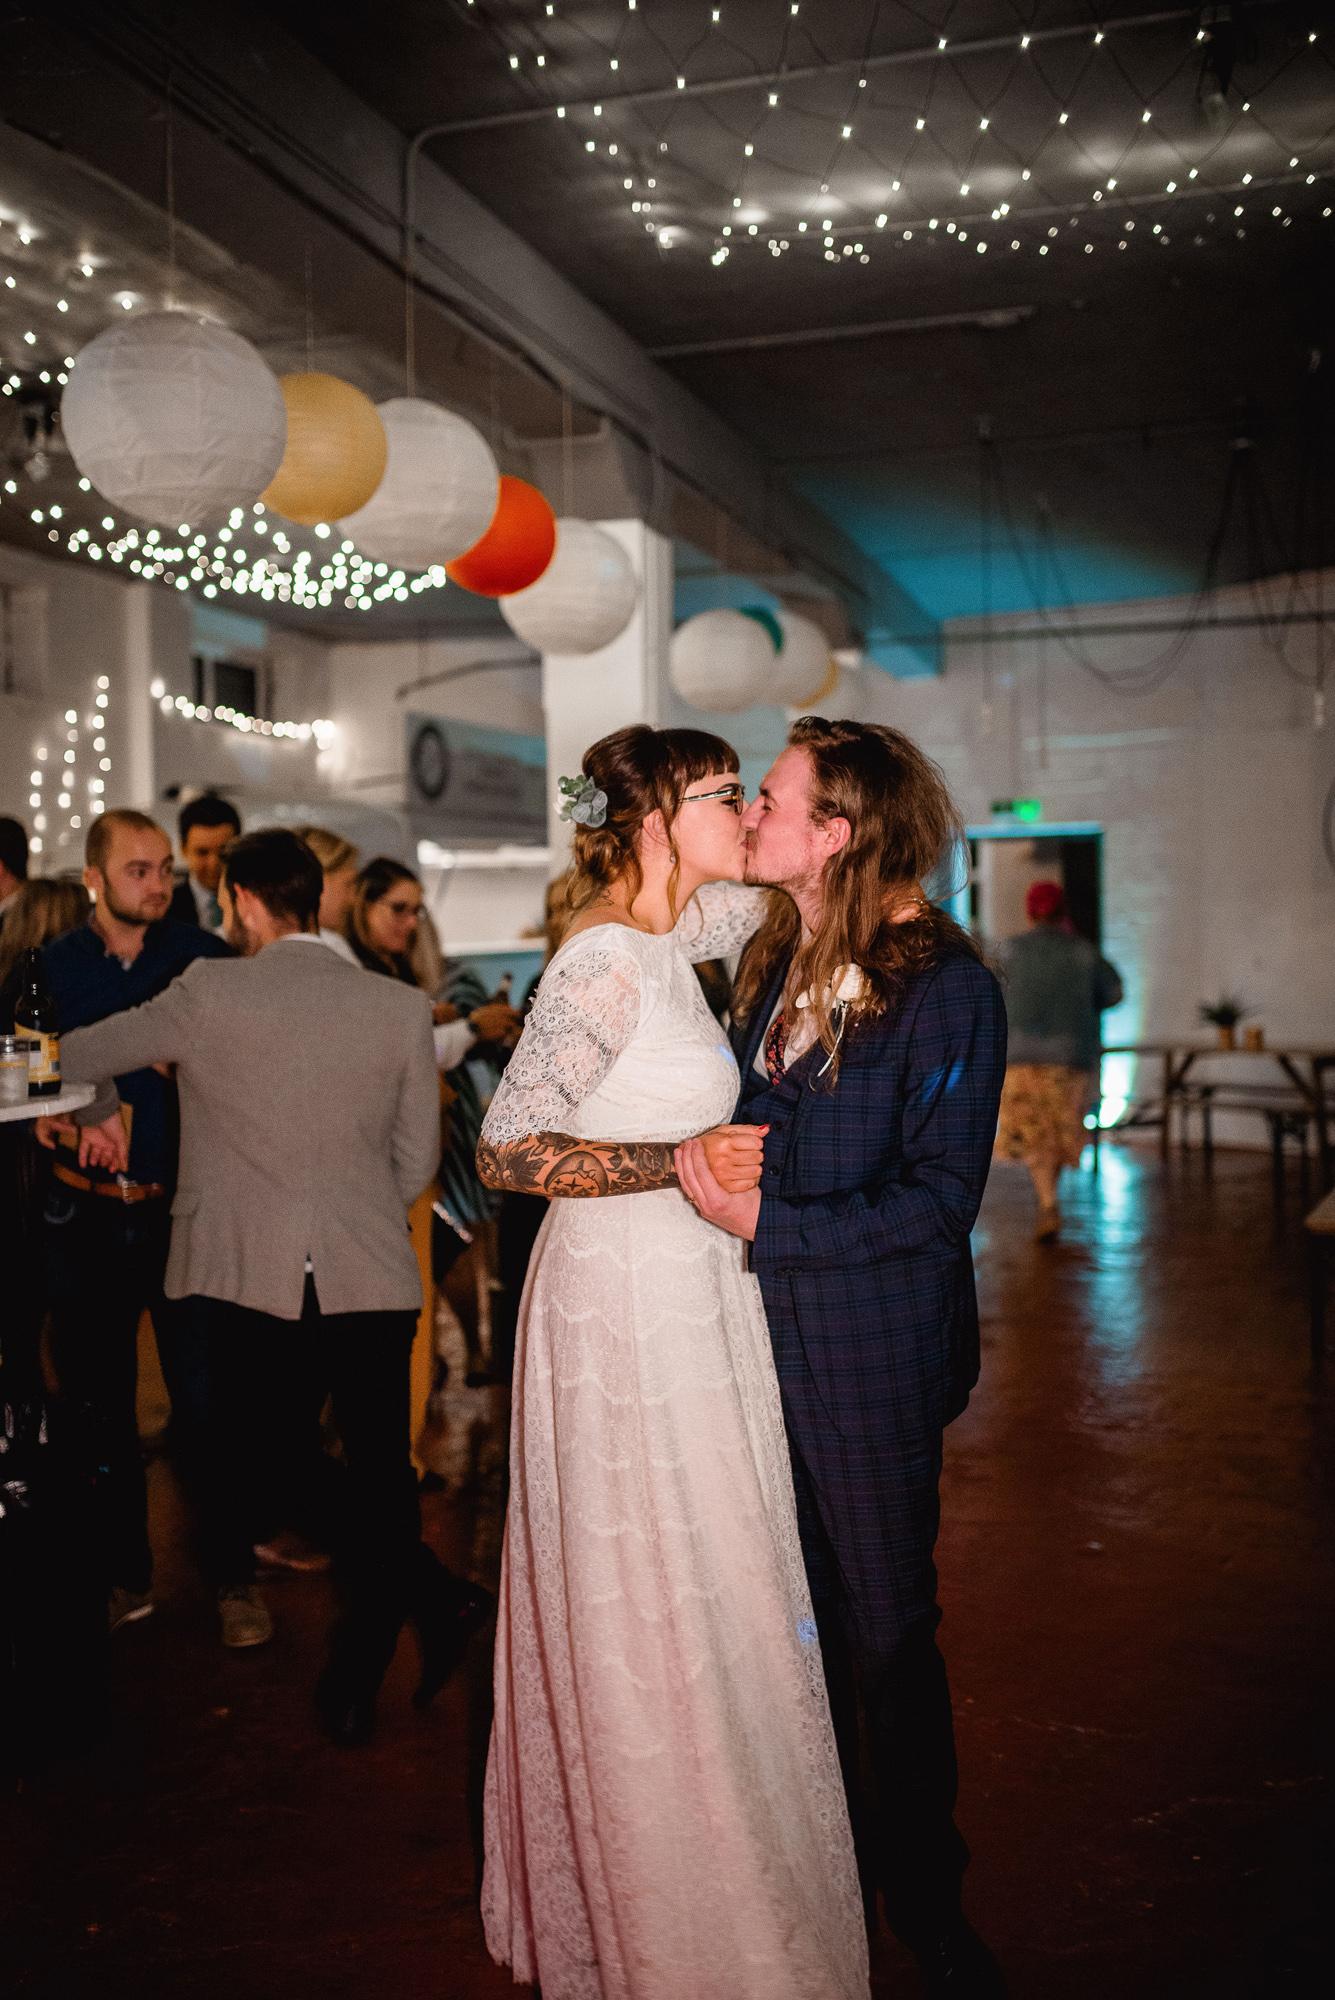 Harriet-Dahlia-Bespoke-Lace-Silk-Bohemian-Wedding-Dress-Sleeves-Tattooed-Bride-Alternative-Wedding-Sheffield-44.jpg